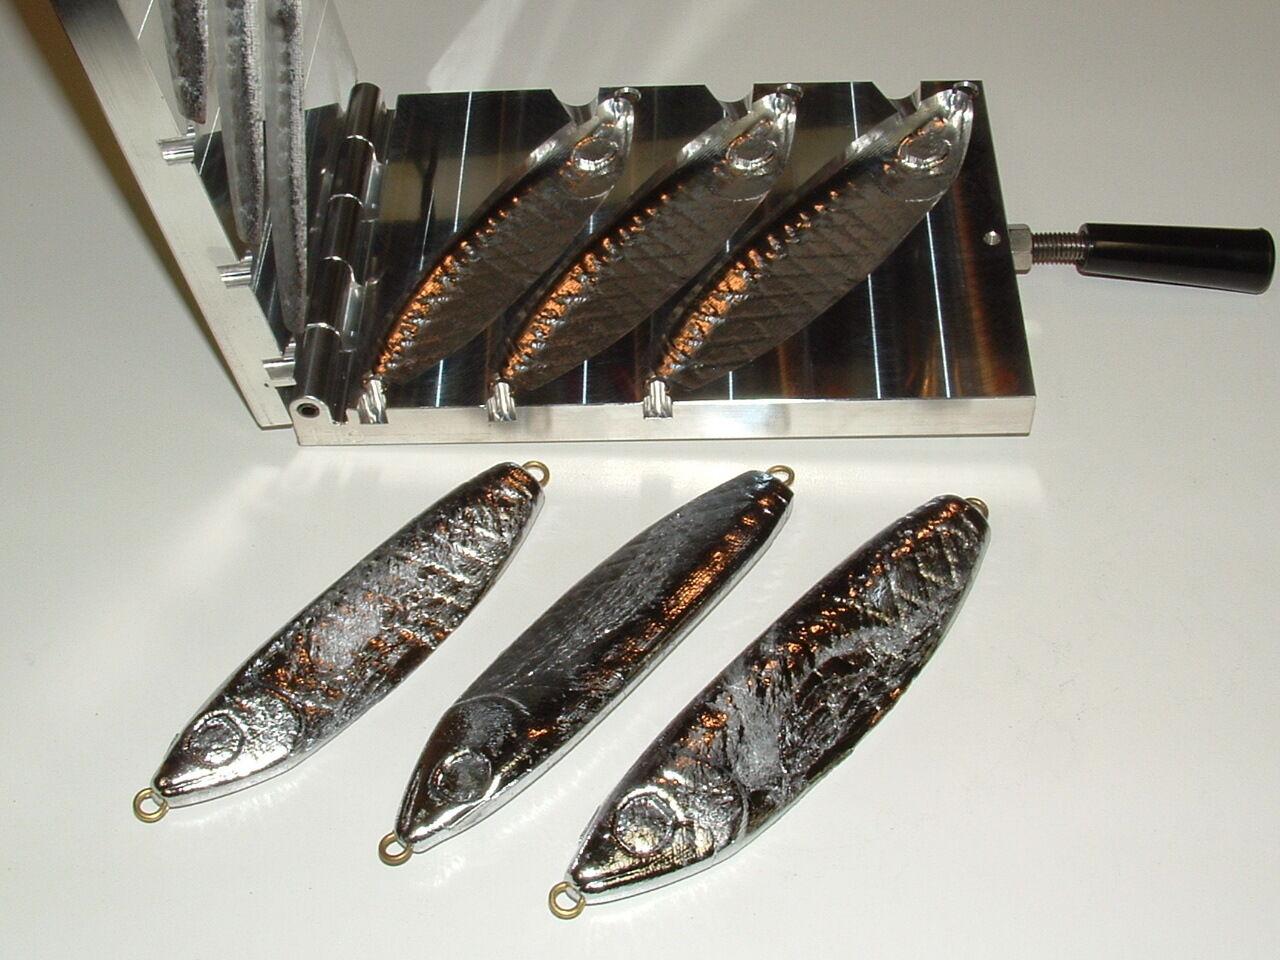 Saltwater Wobble Fish Jig mold 16,20,24oz CNC Aluminum Herring